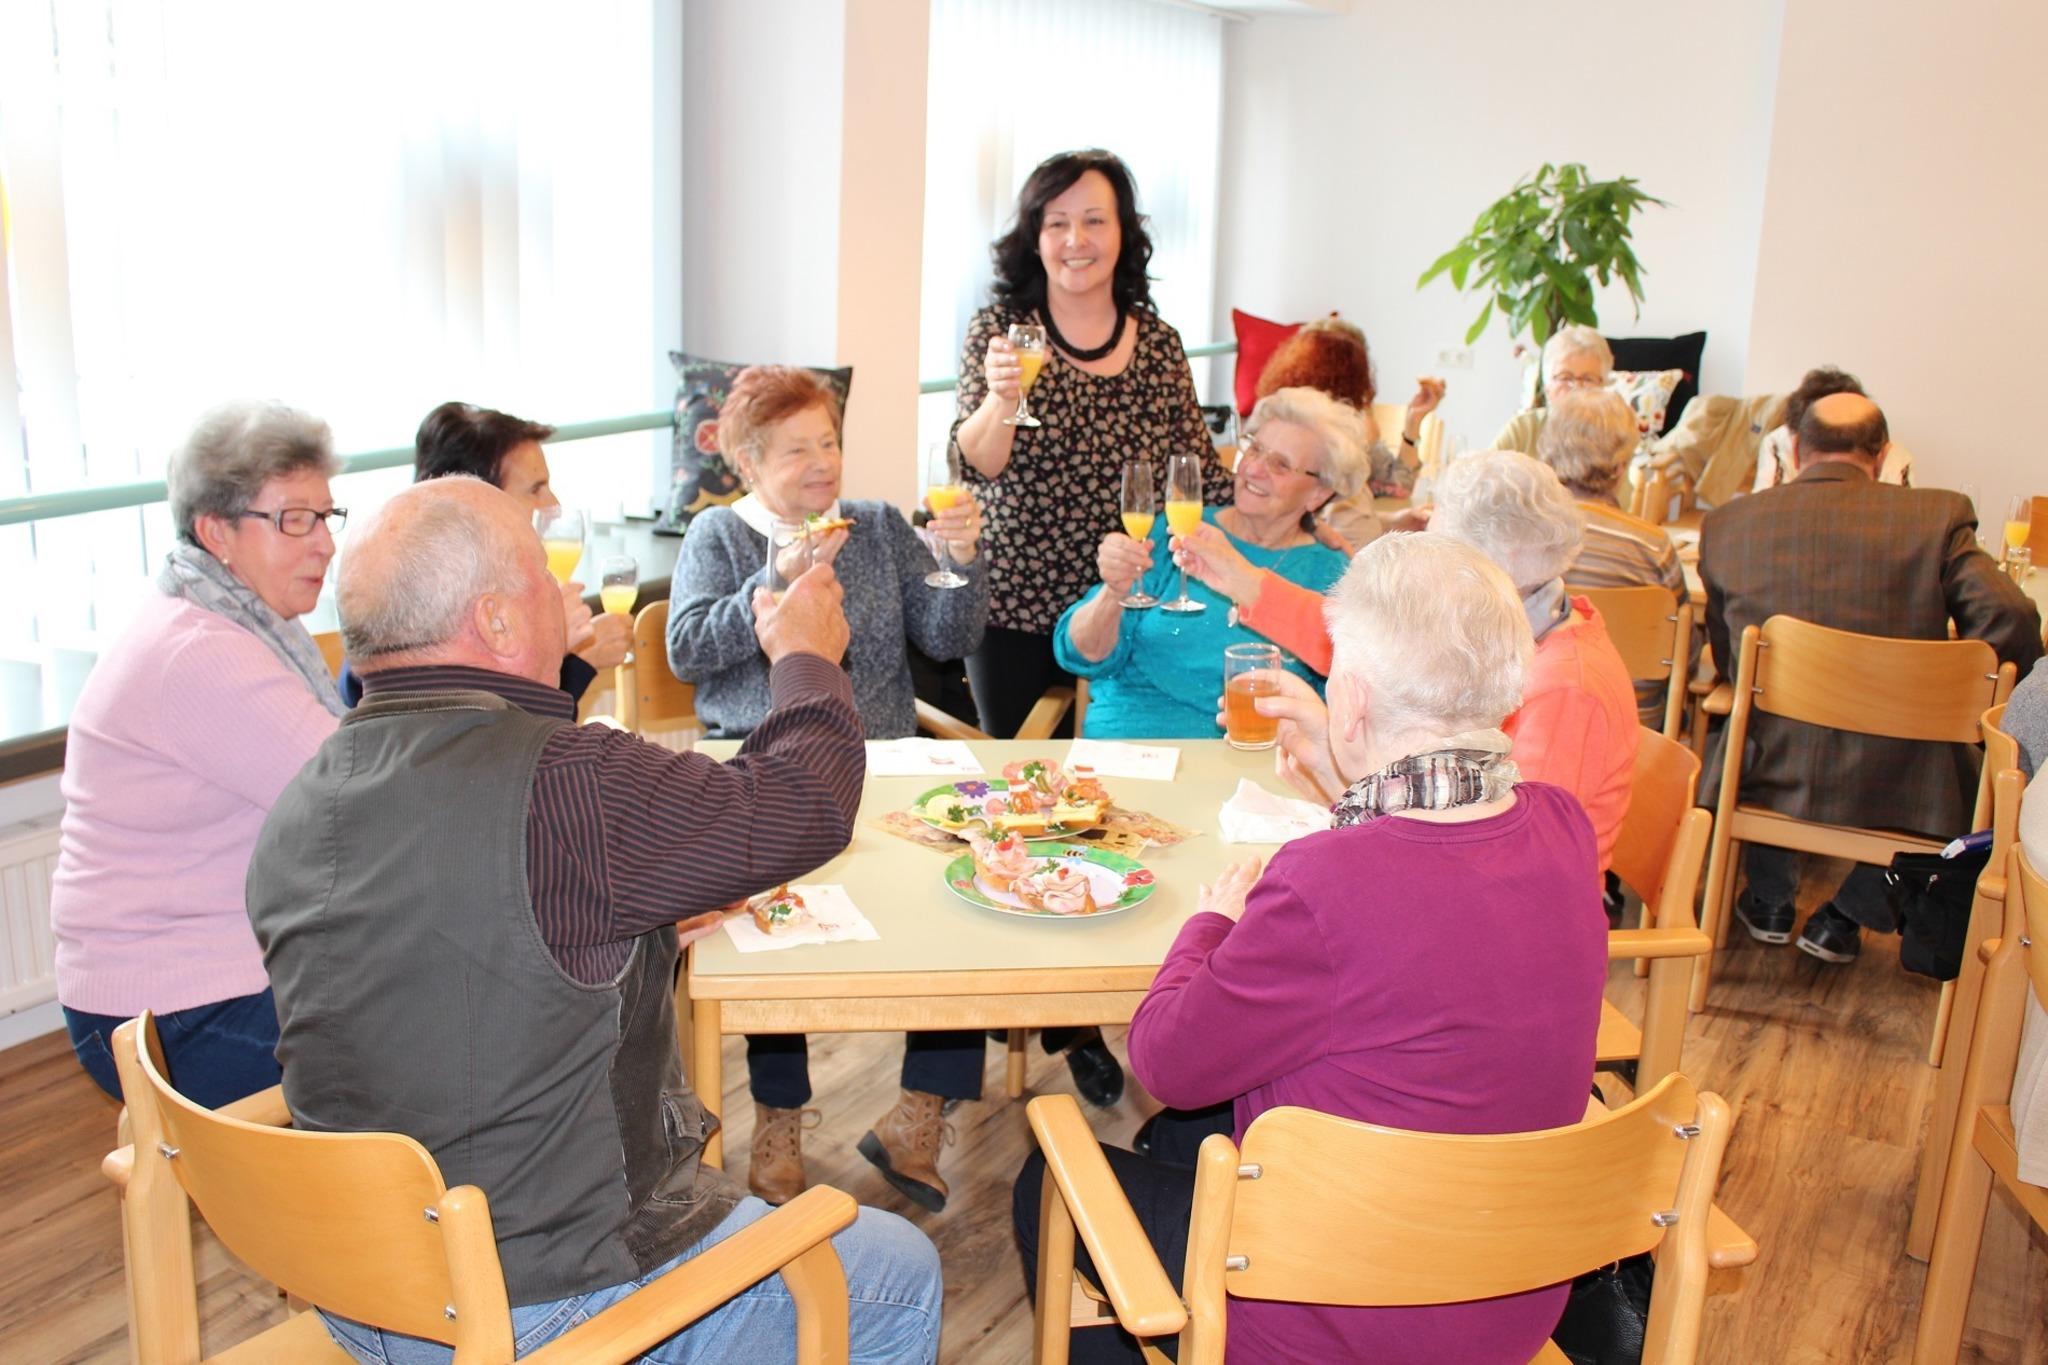 Lerchenfeld frau single Partnersuche naturverbunden